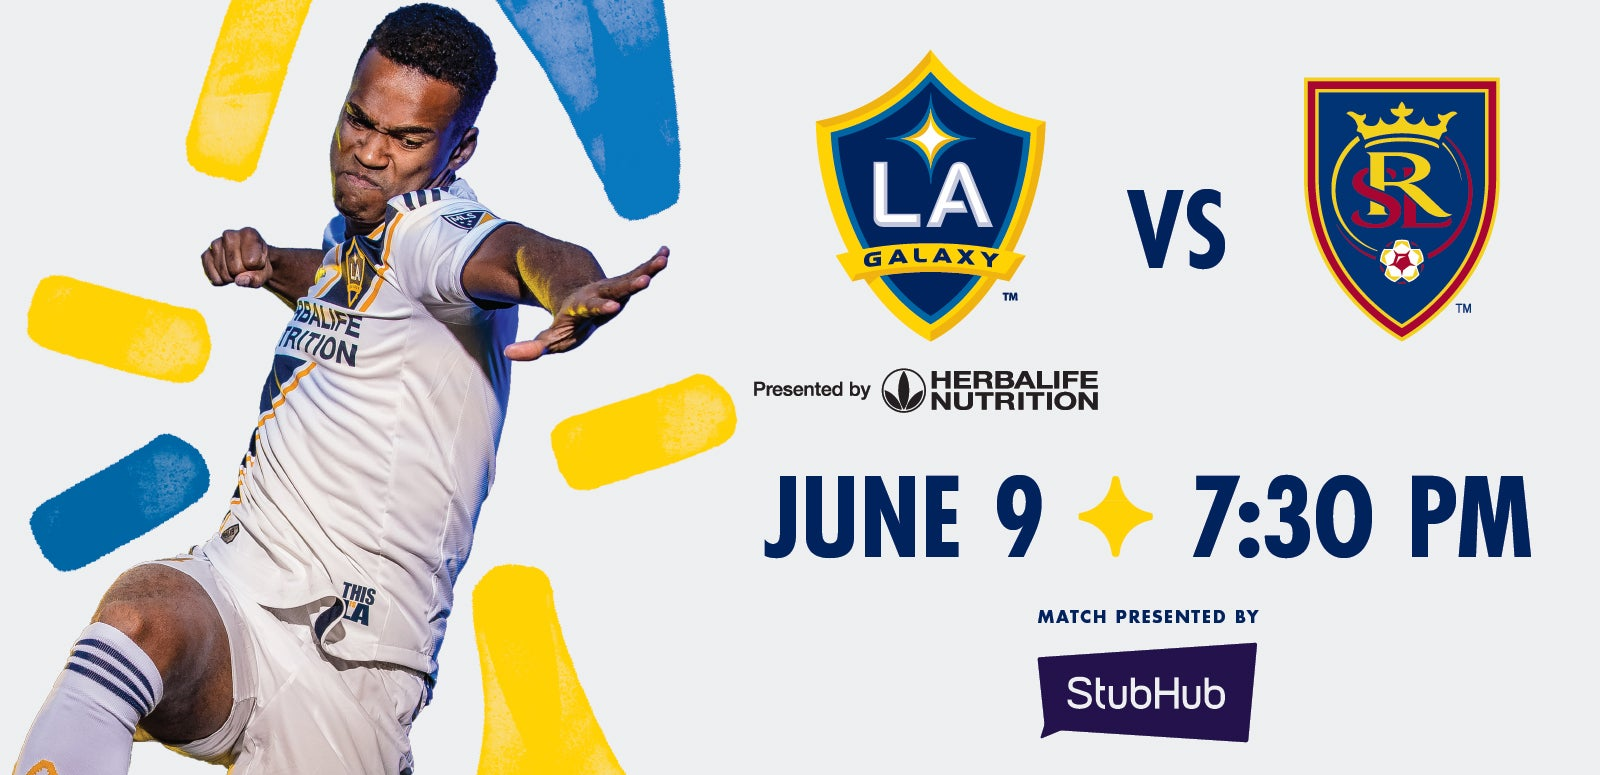 LA Galaxy vs. Real Salt Lake